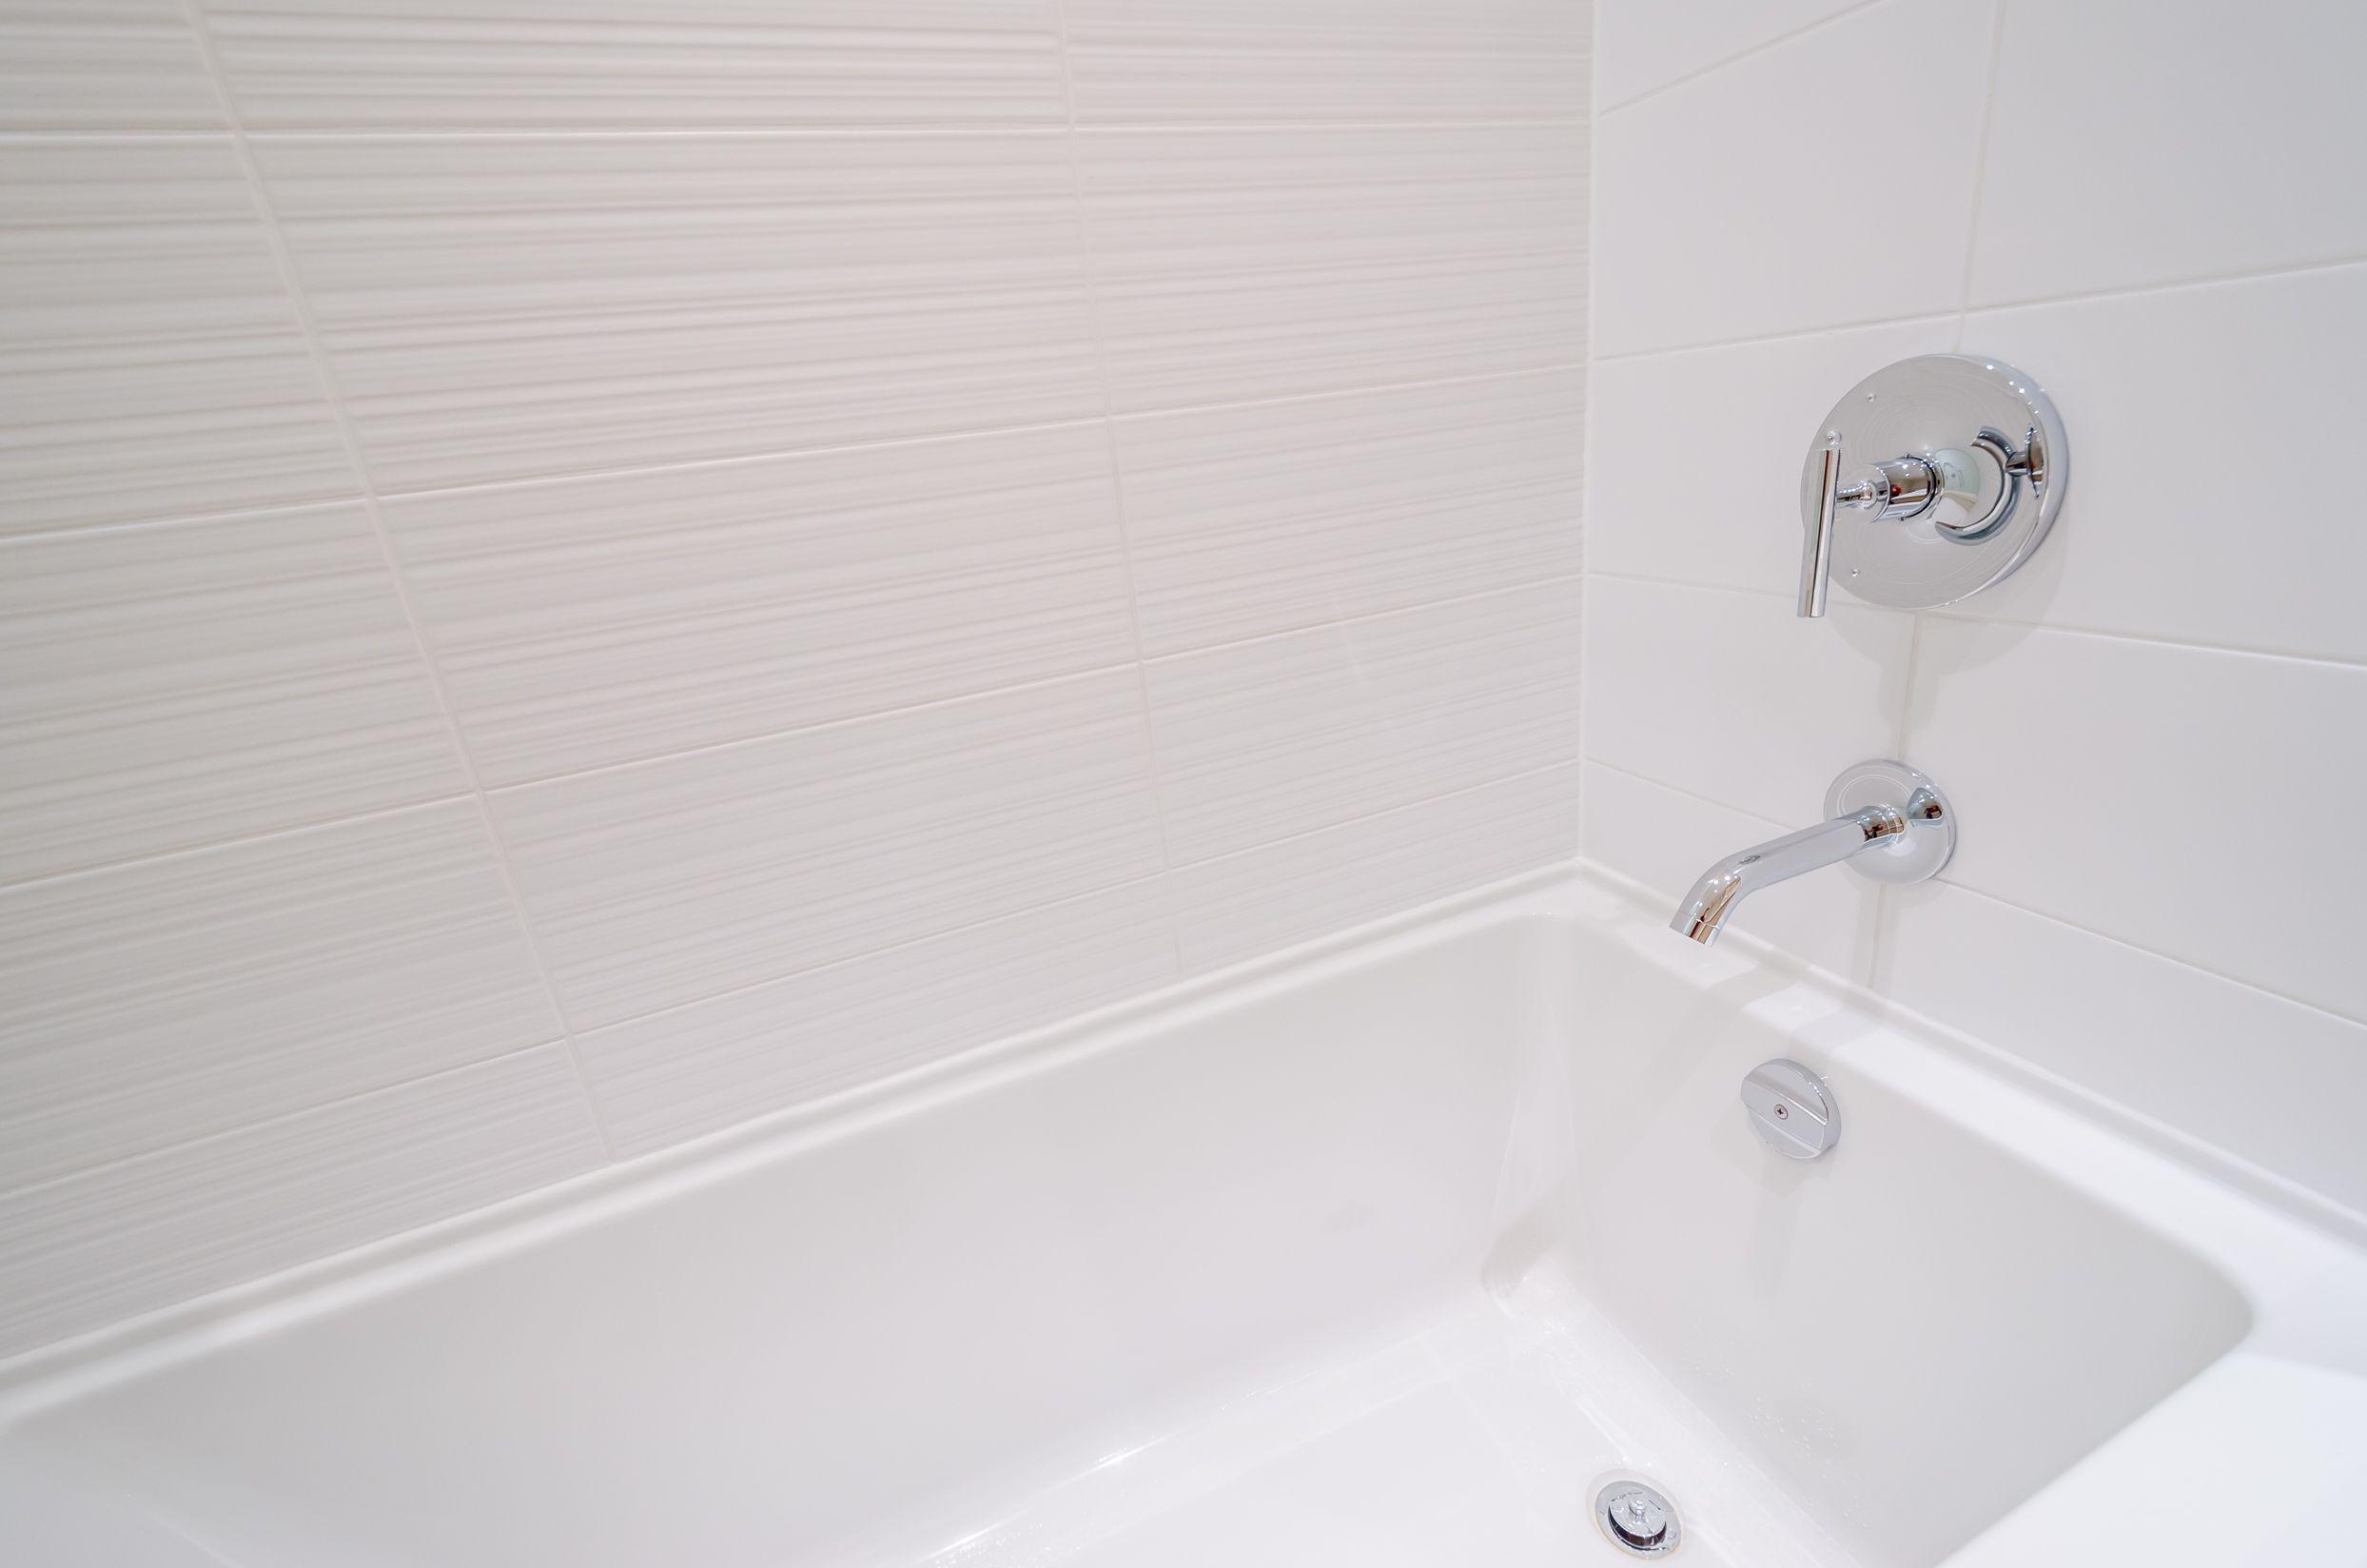 Fragment of a luxury bathroom with a detail of bathtub.